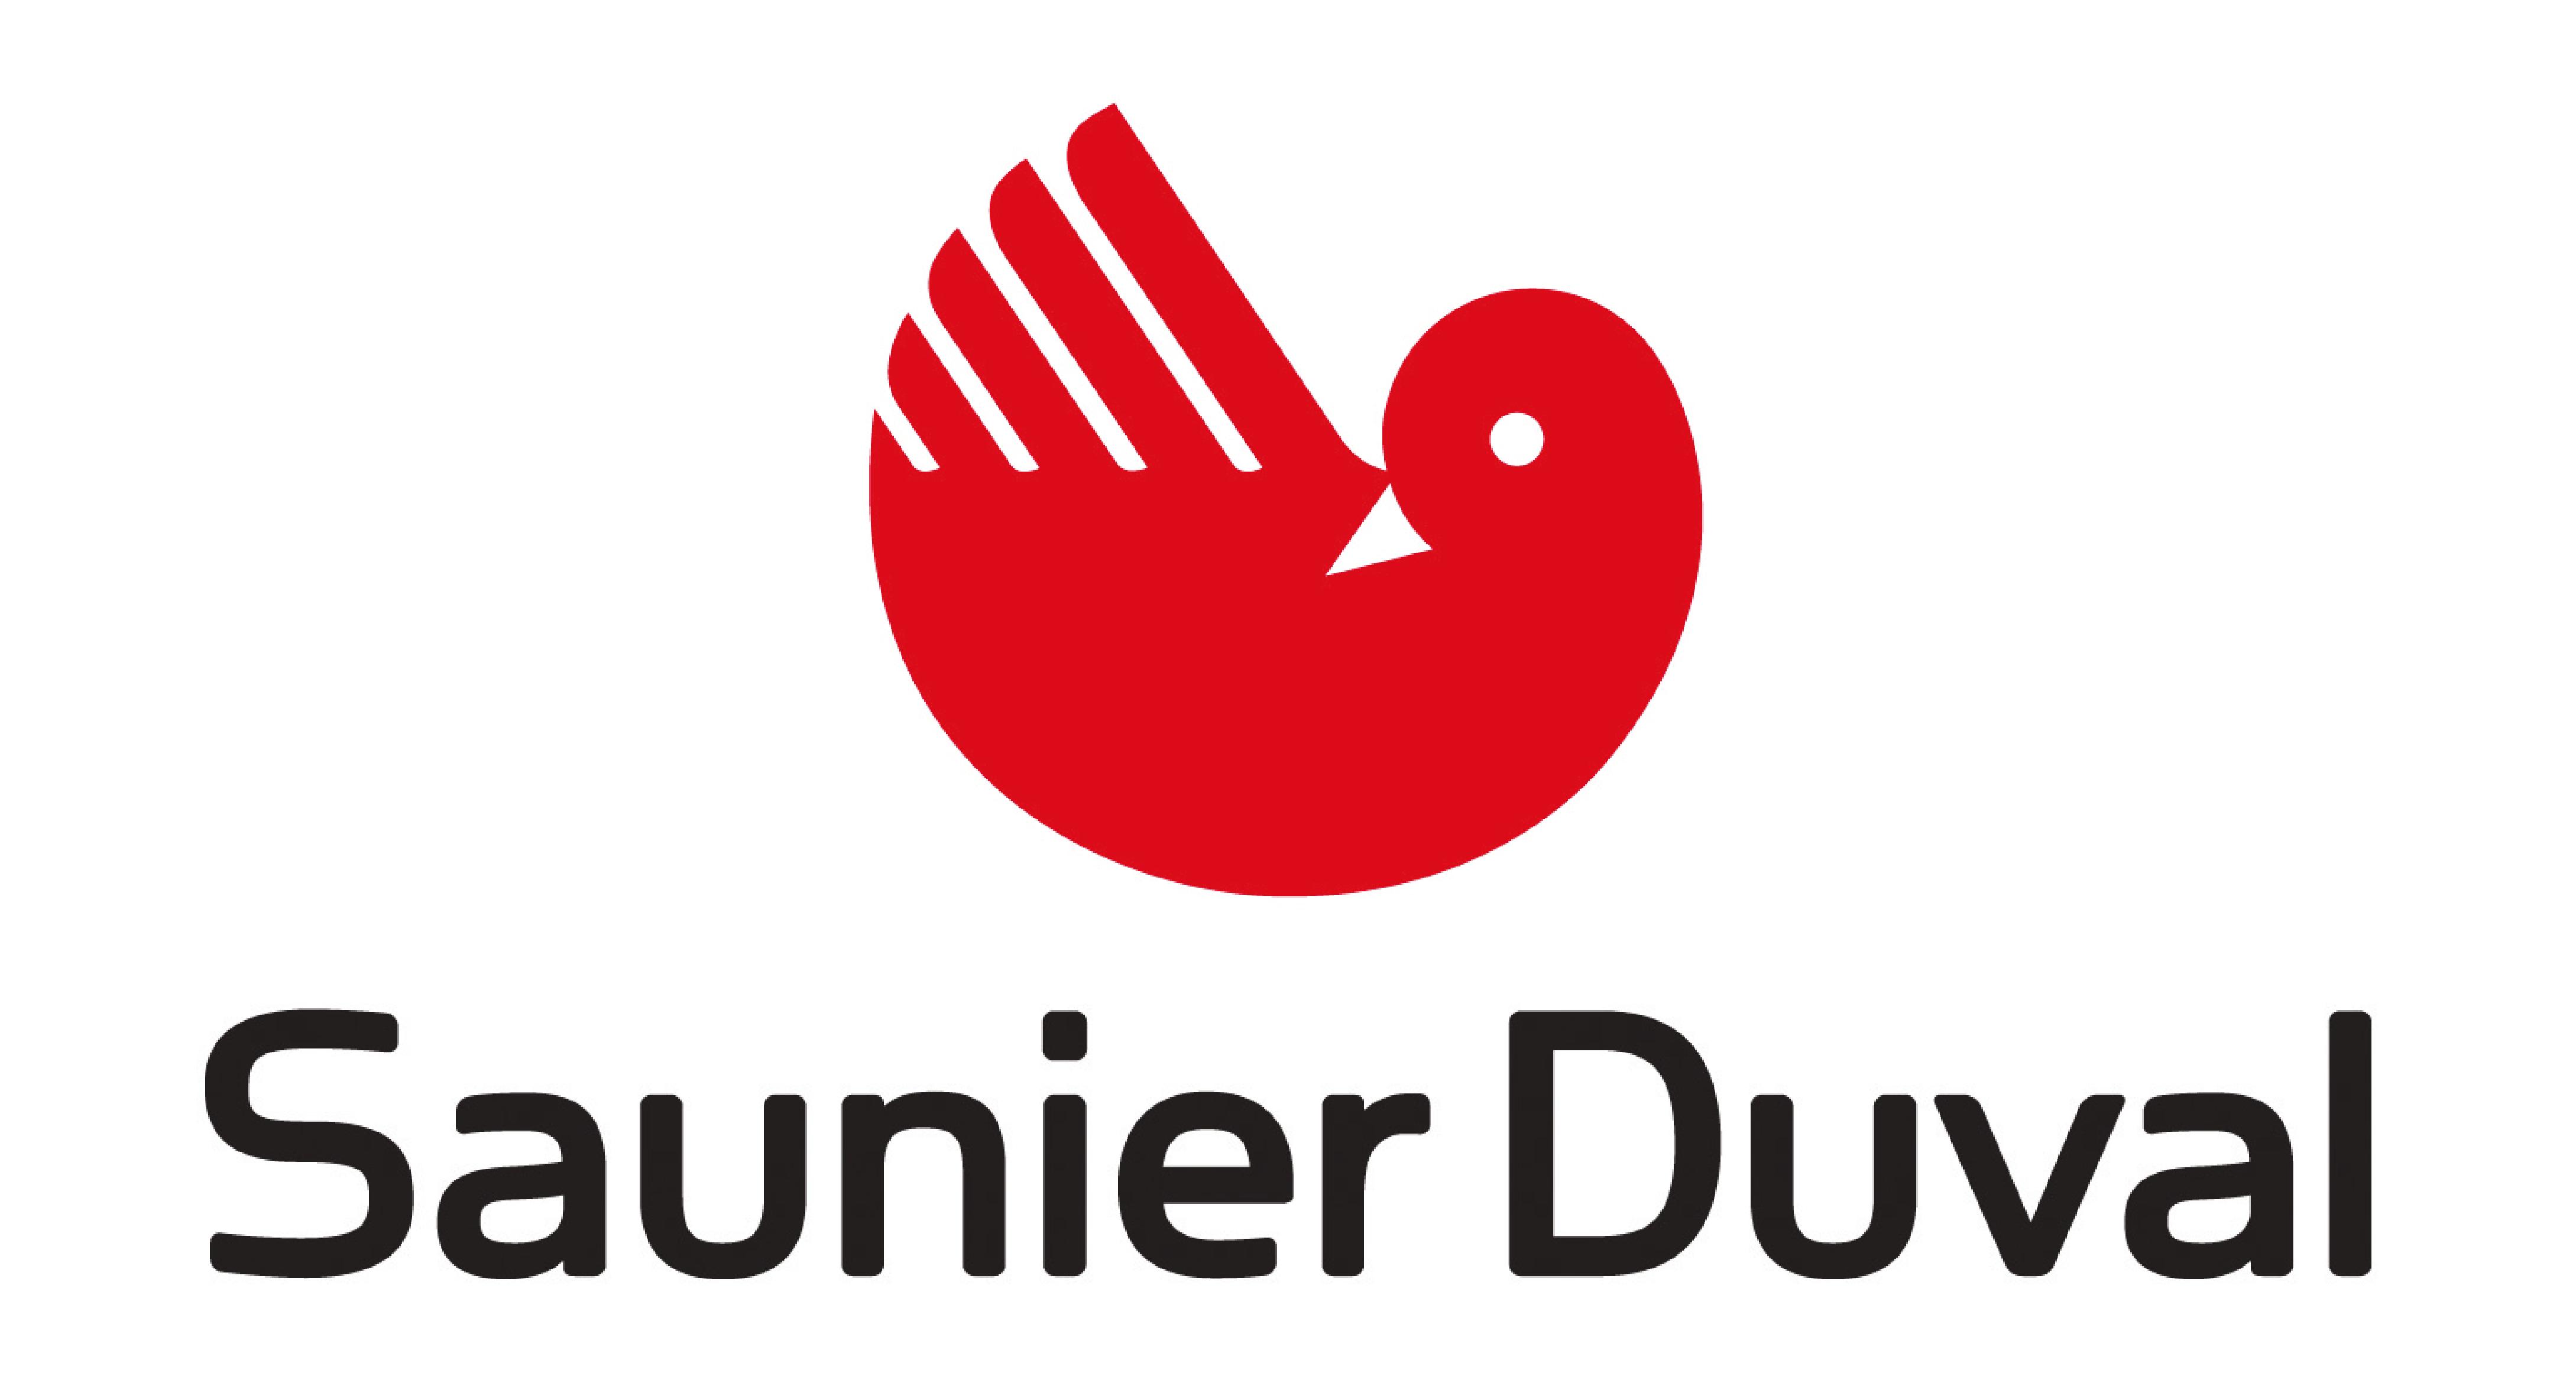 Saunier Duval logo